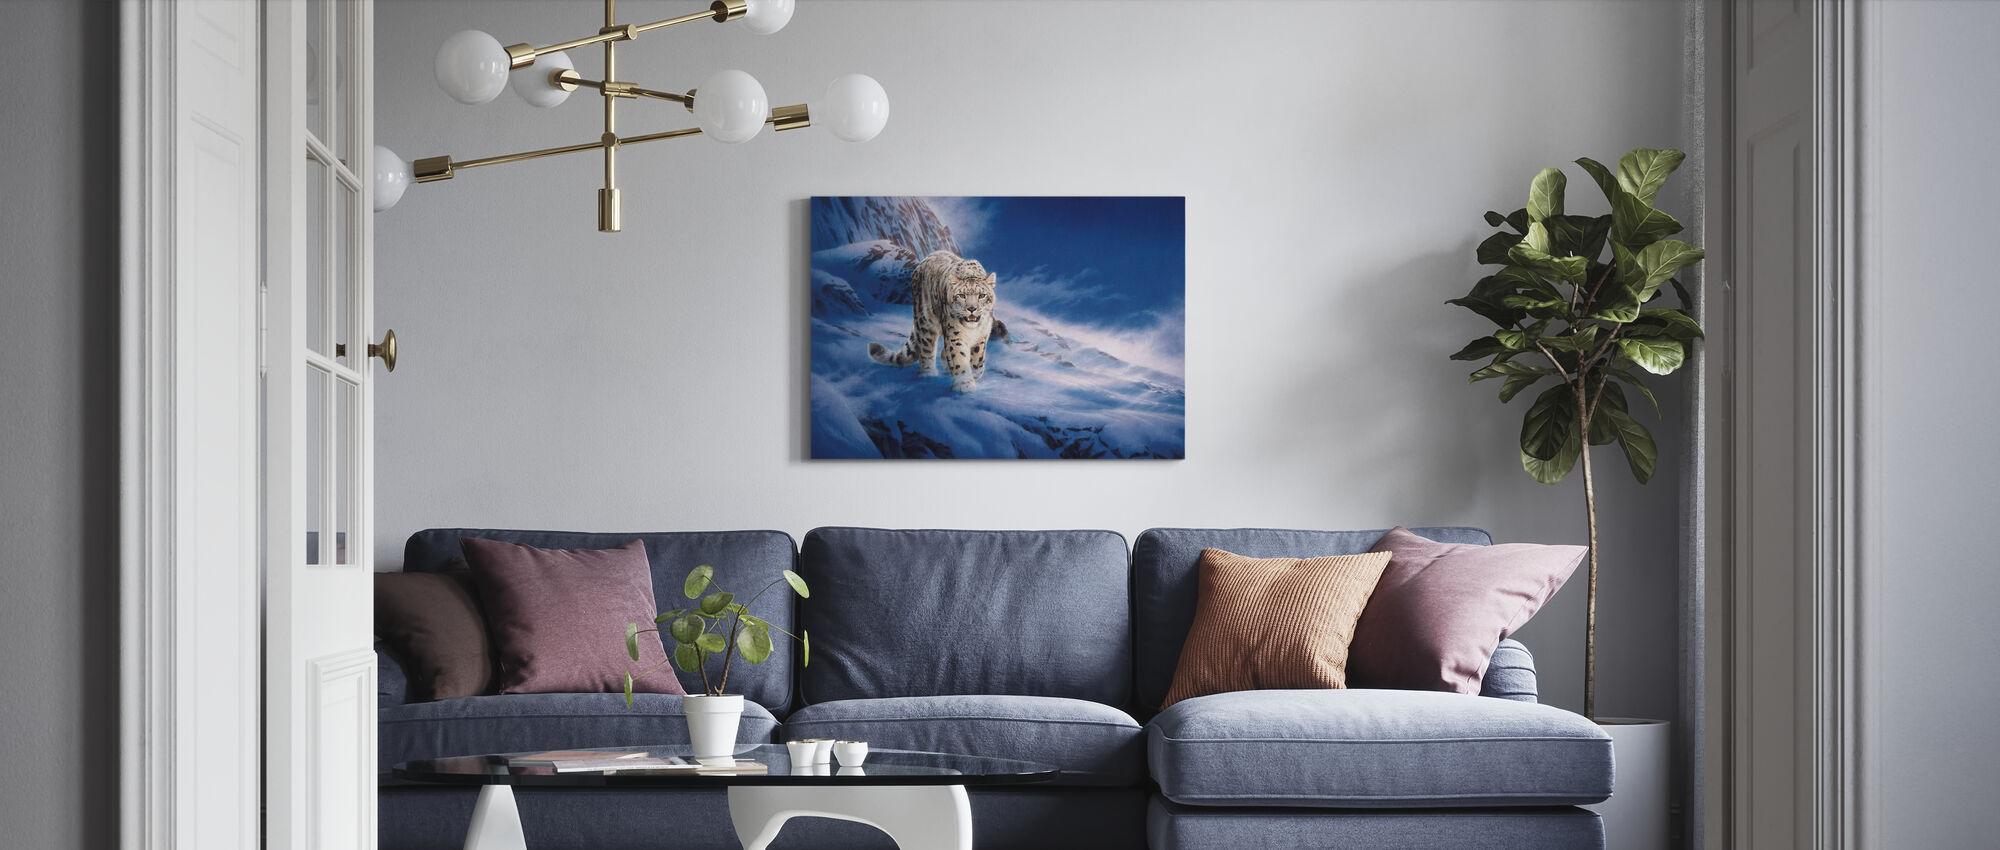 Snow Leopard - Canvas print - Living Room